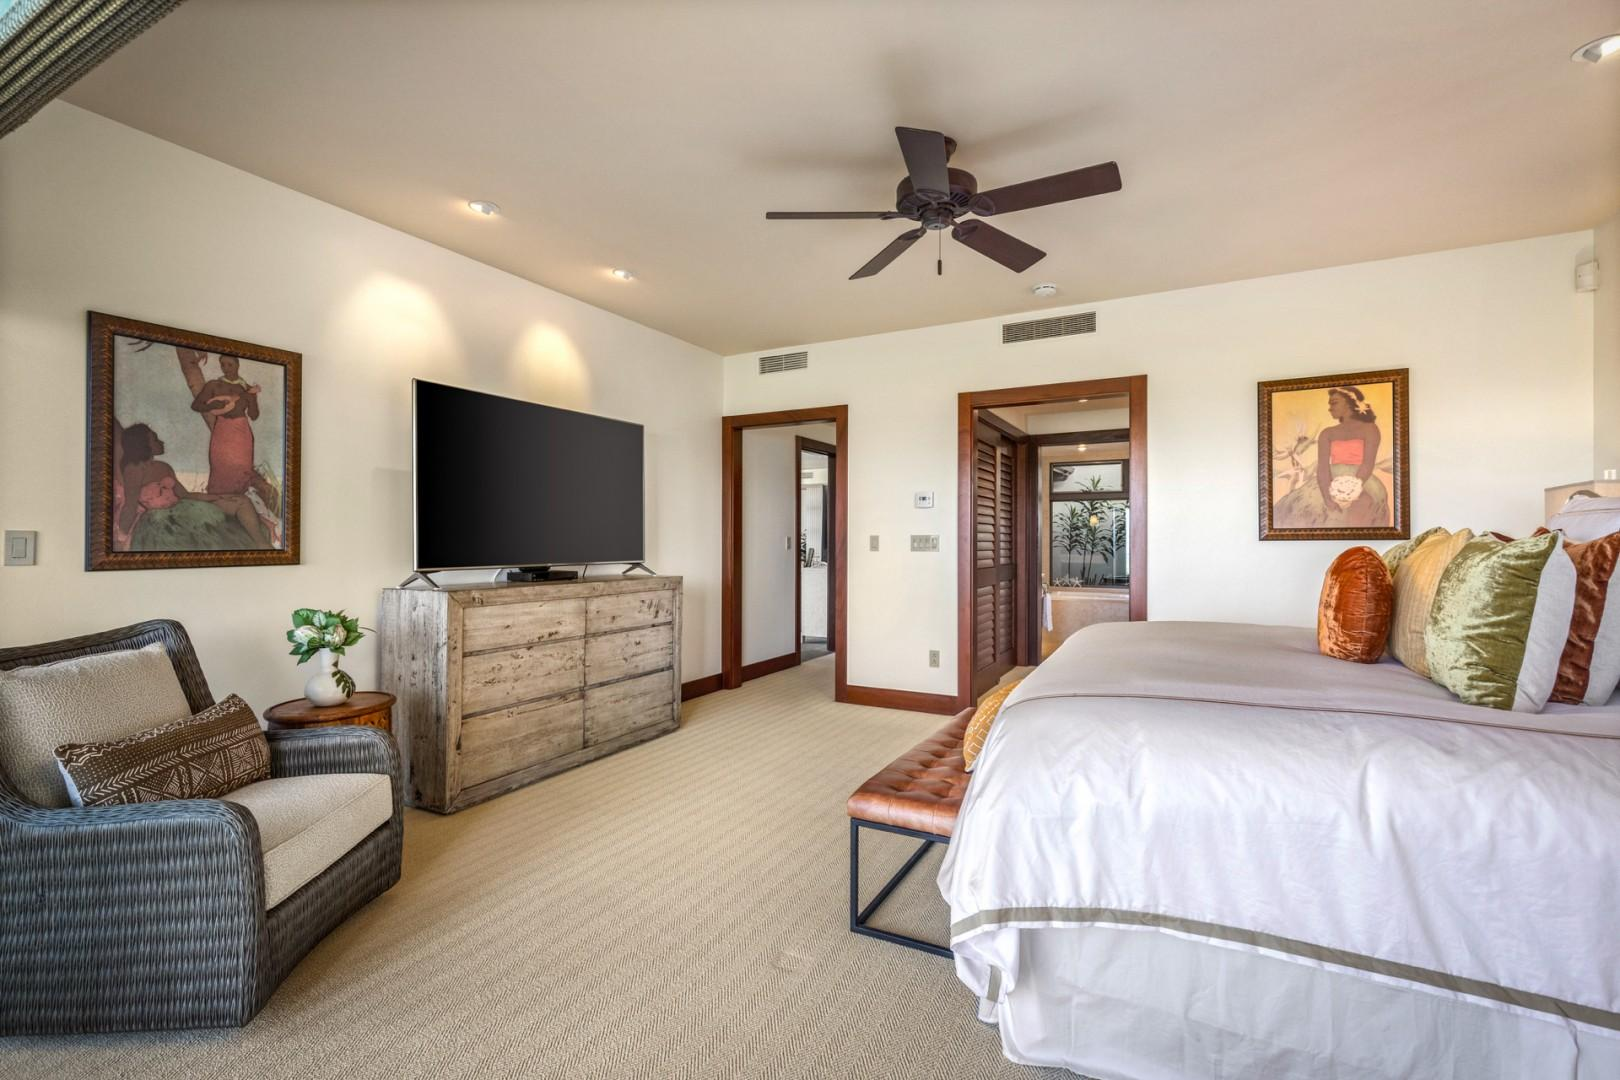 View of ocean view master suite toward walk-in closet and en suite bath showcasing large flat screen TV.